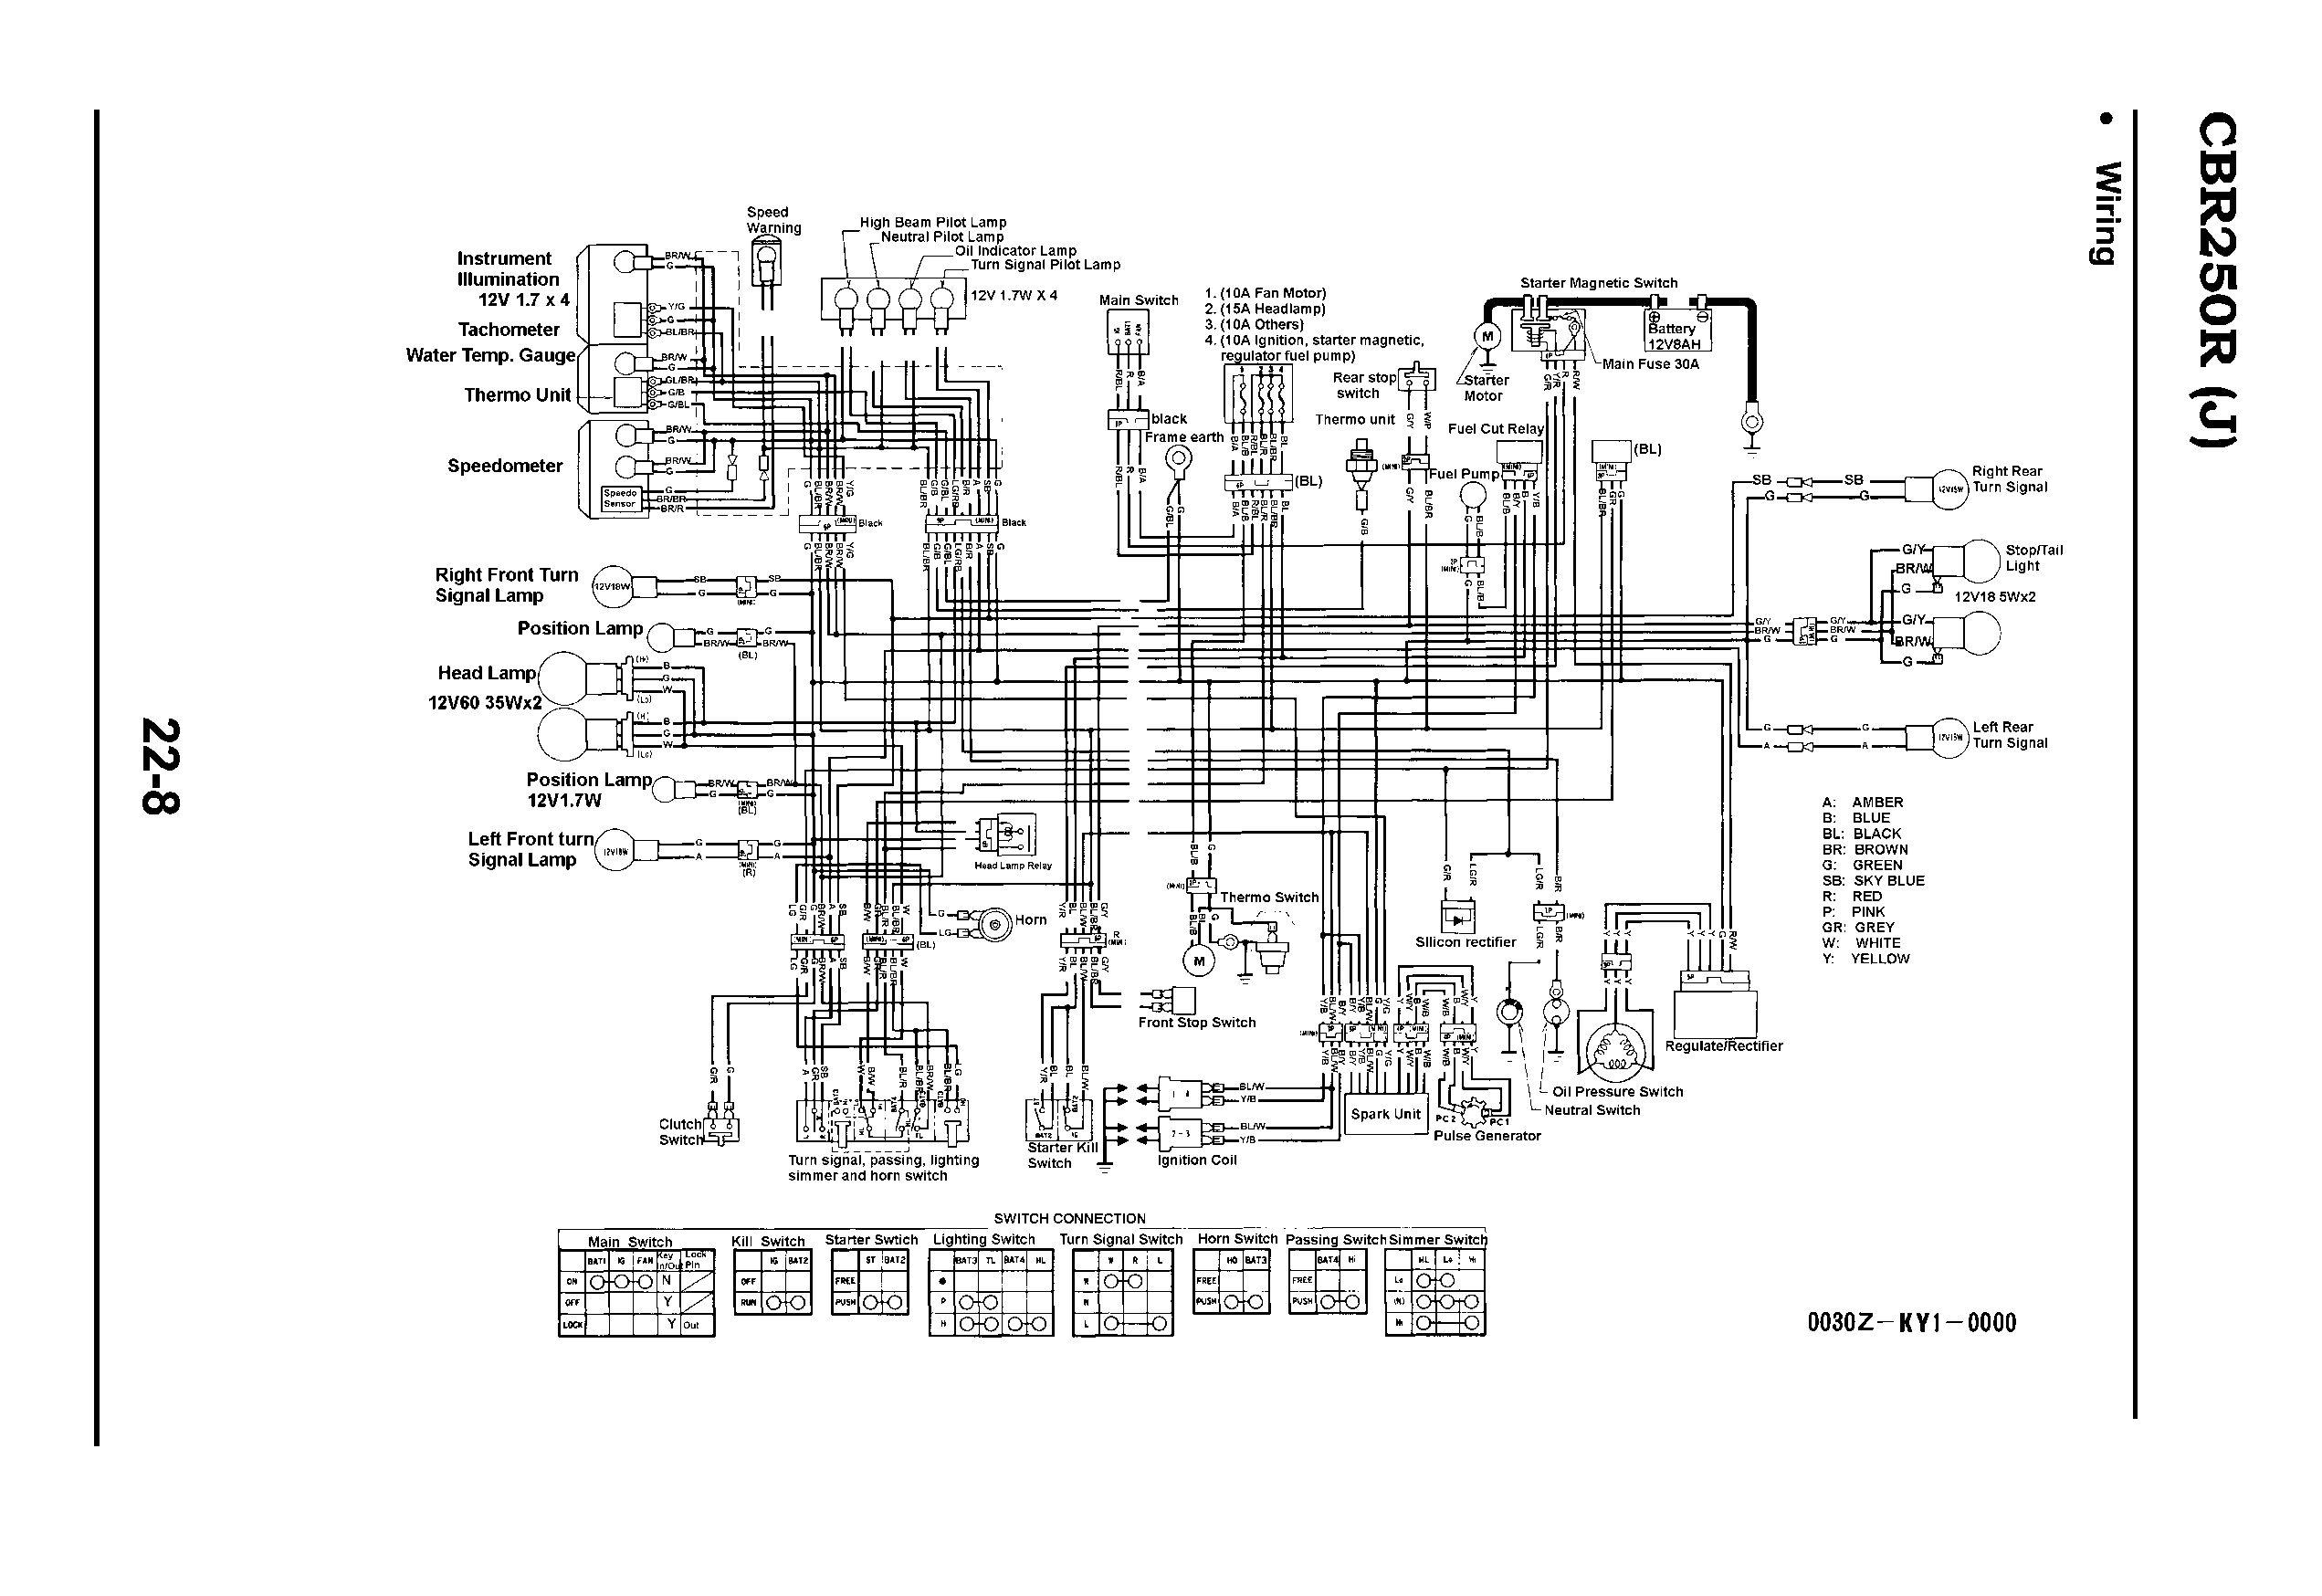 RA_3570] Pics Photos Honda Cbr250R Ignition System Schematic And Diagram  Free DiagramRatag Ginou Gue45 Mohammedshrine Librar Wiring 101